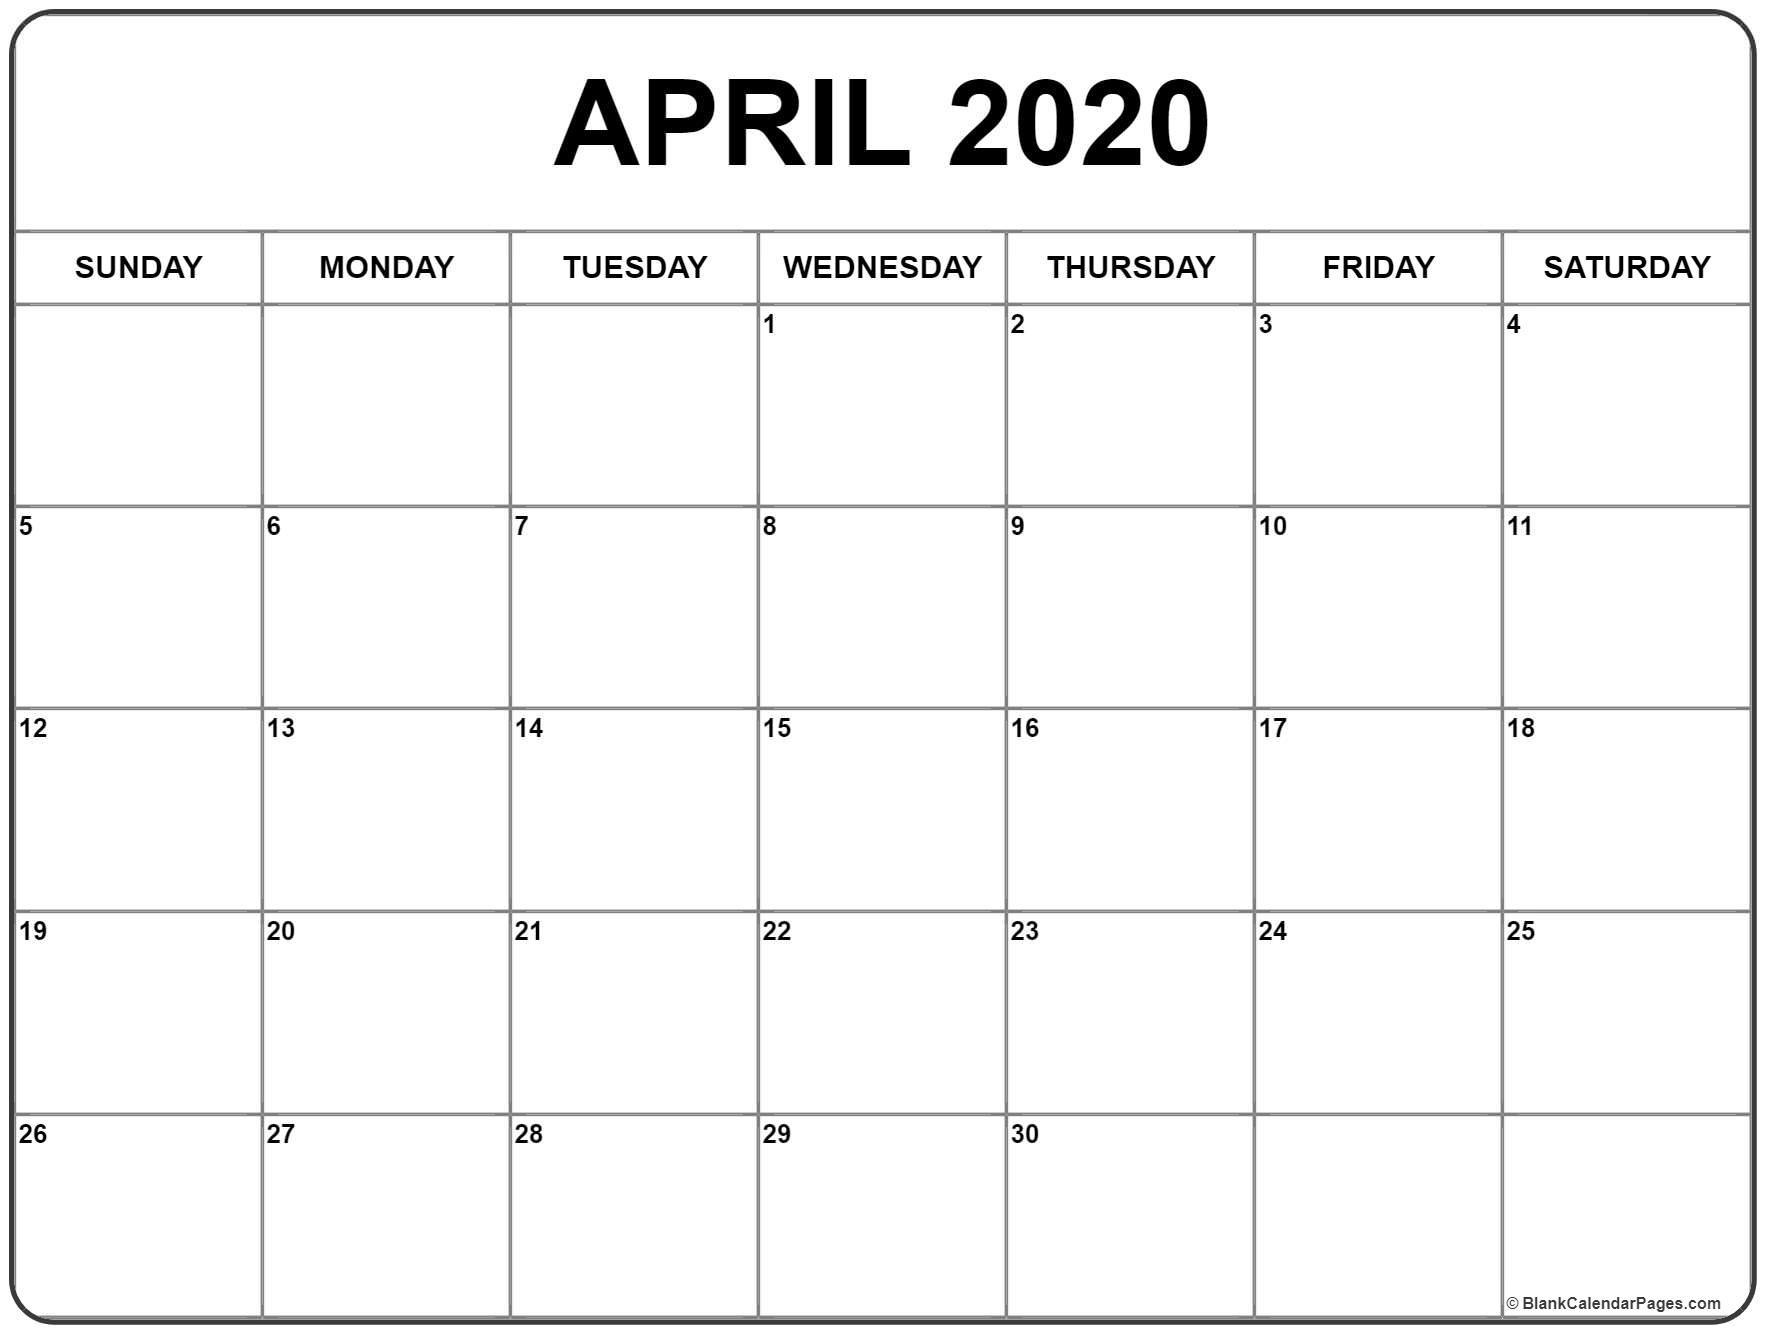 April 2020 Calendar | Free Printable Monthly Calendars intended for Free Printable Calendar 2020 Motivational